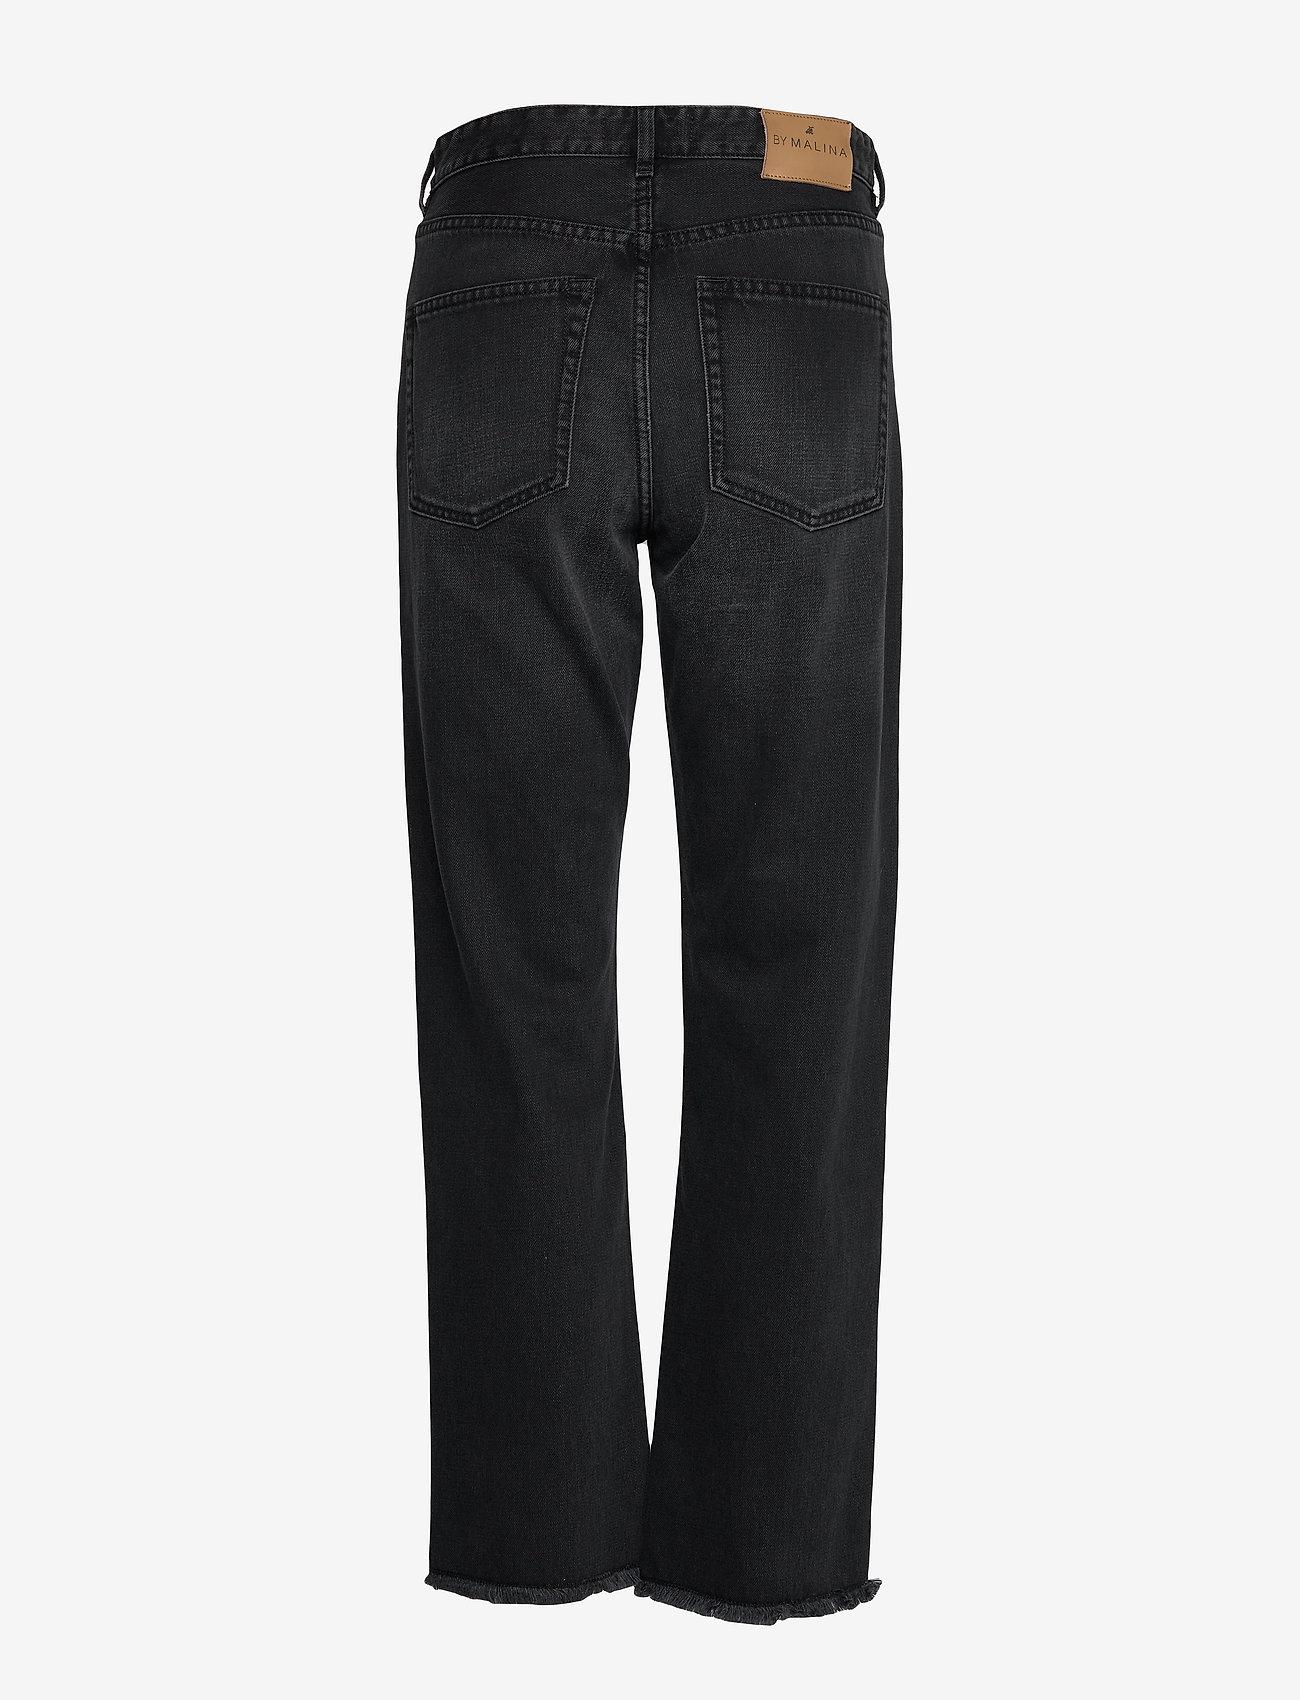 By Malina - Alexa jeans - straight regular - black - 2